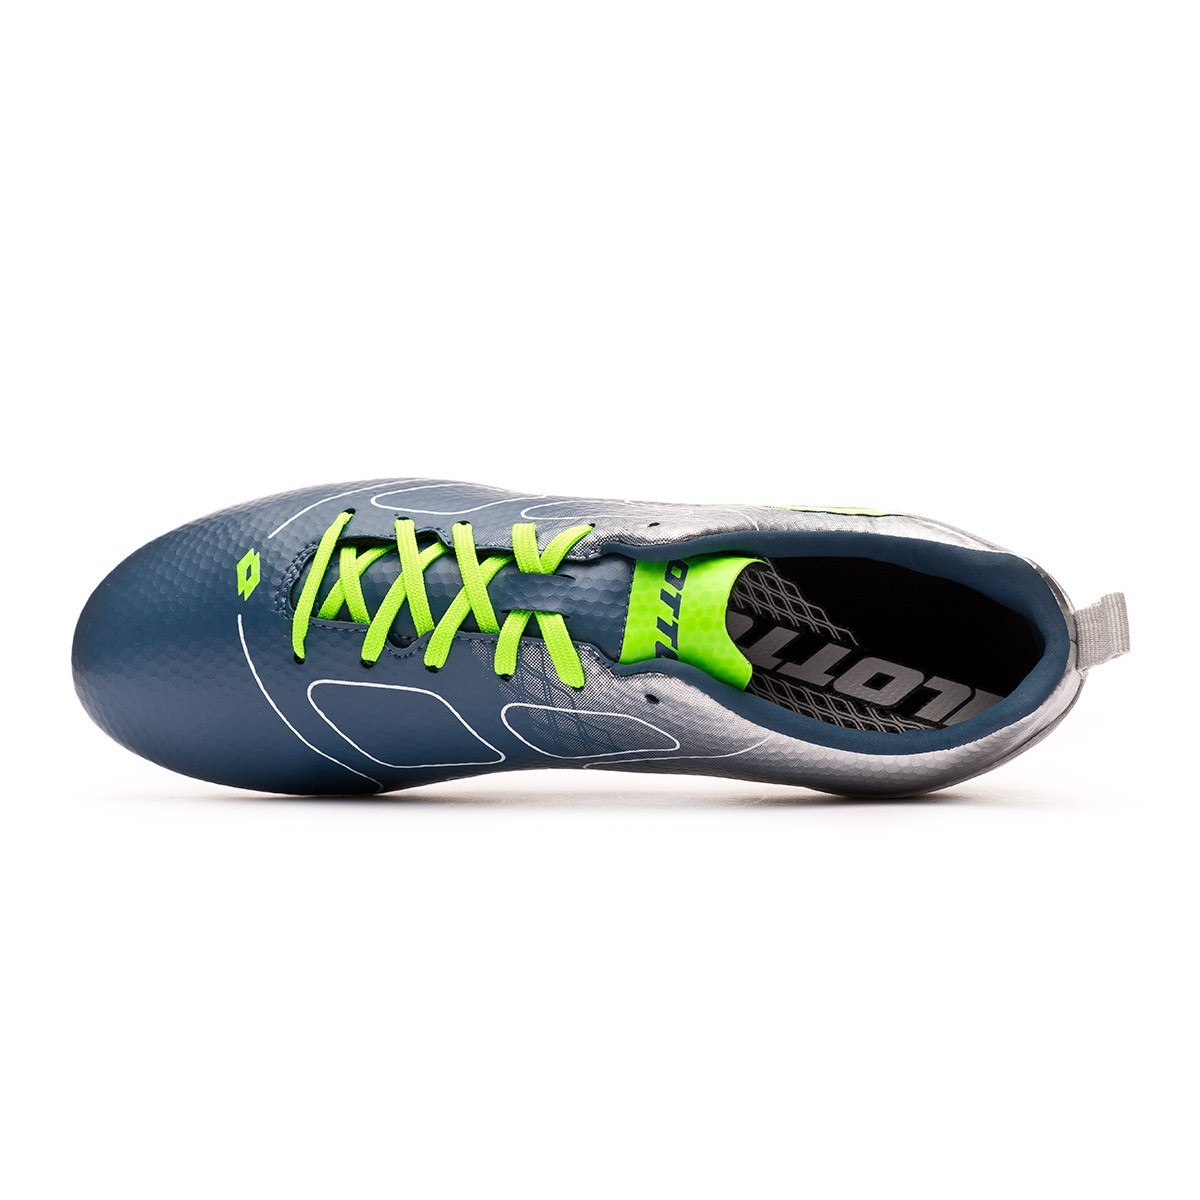 947c45958372 Football Boots Lotto Maestro 700 AG Blue city-Mint - Football store Fútbol  Emotion